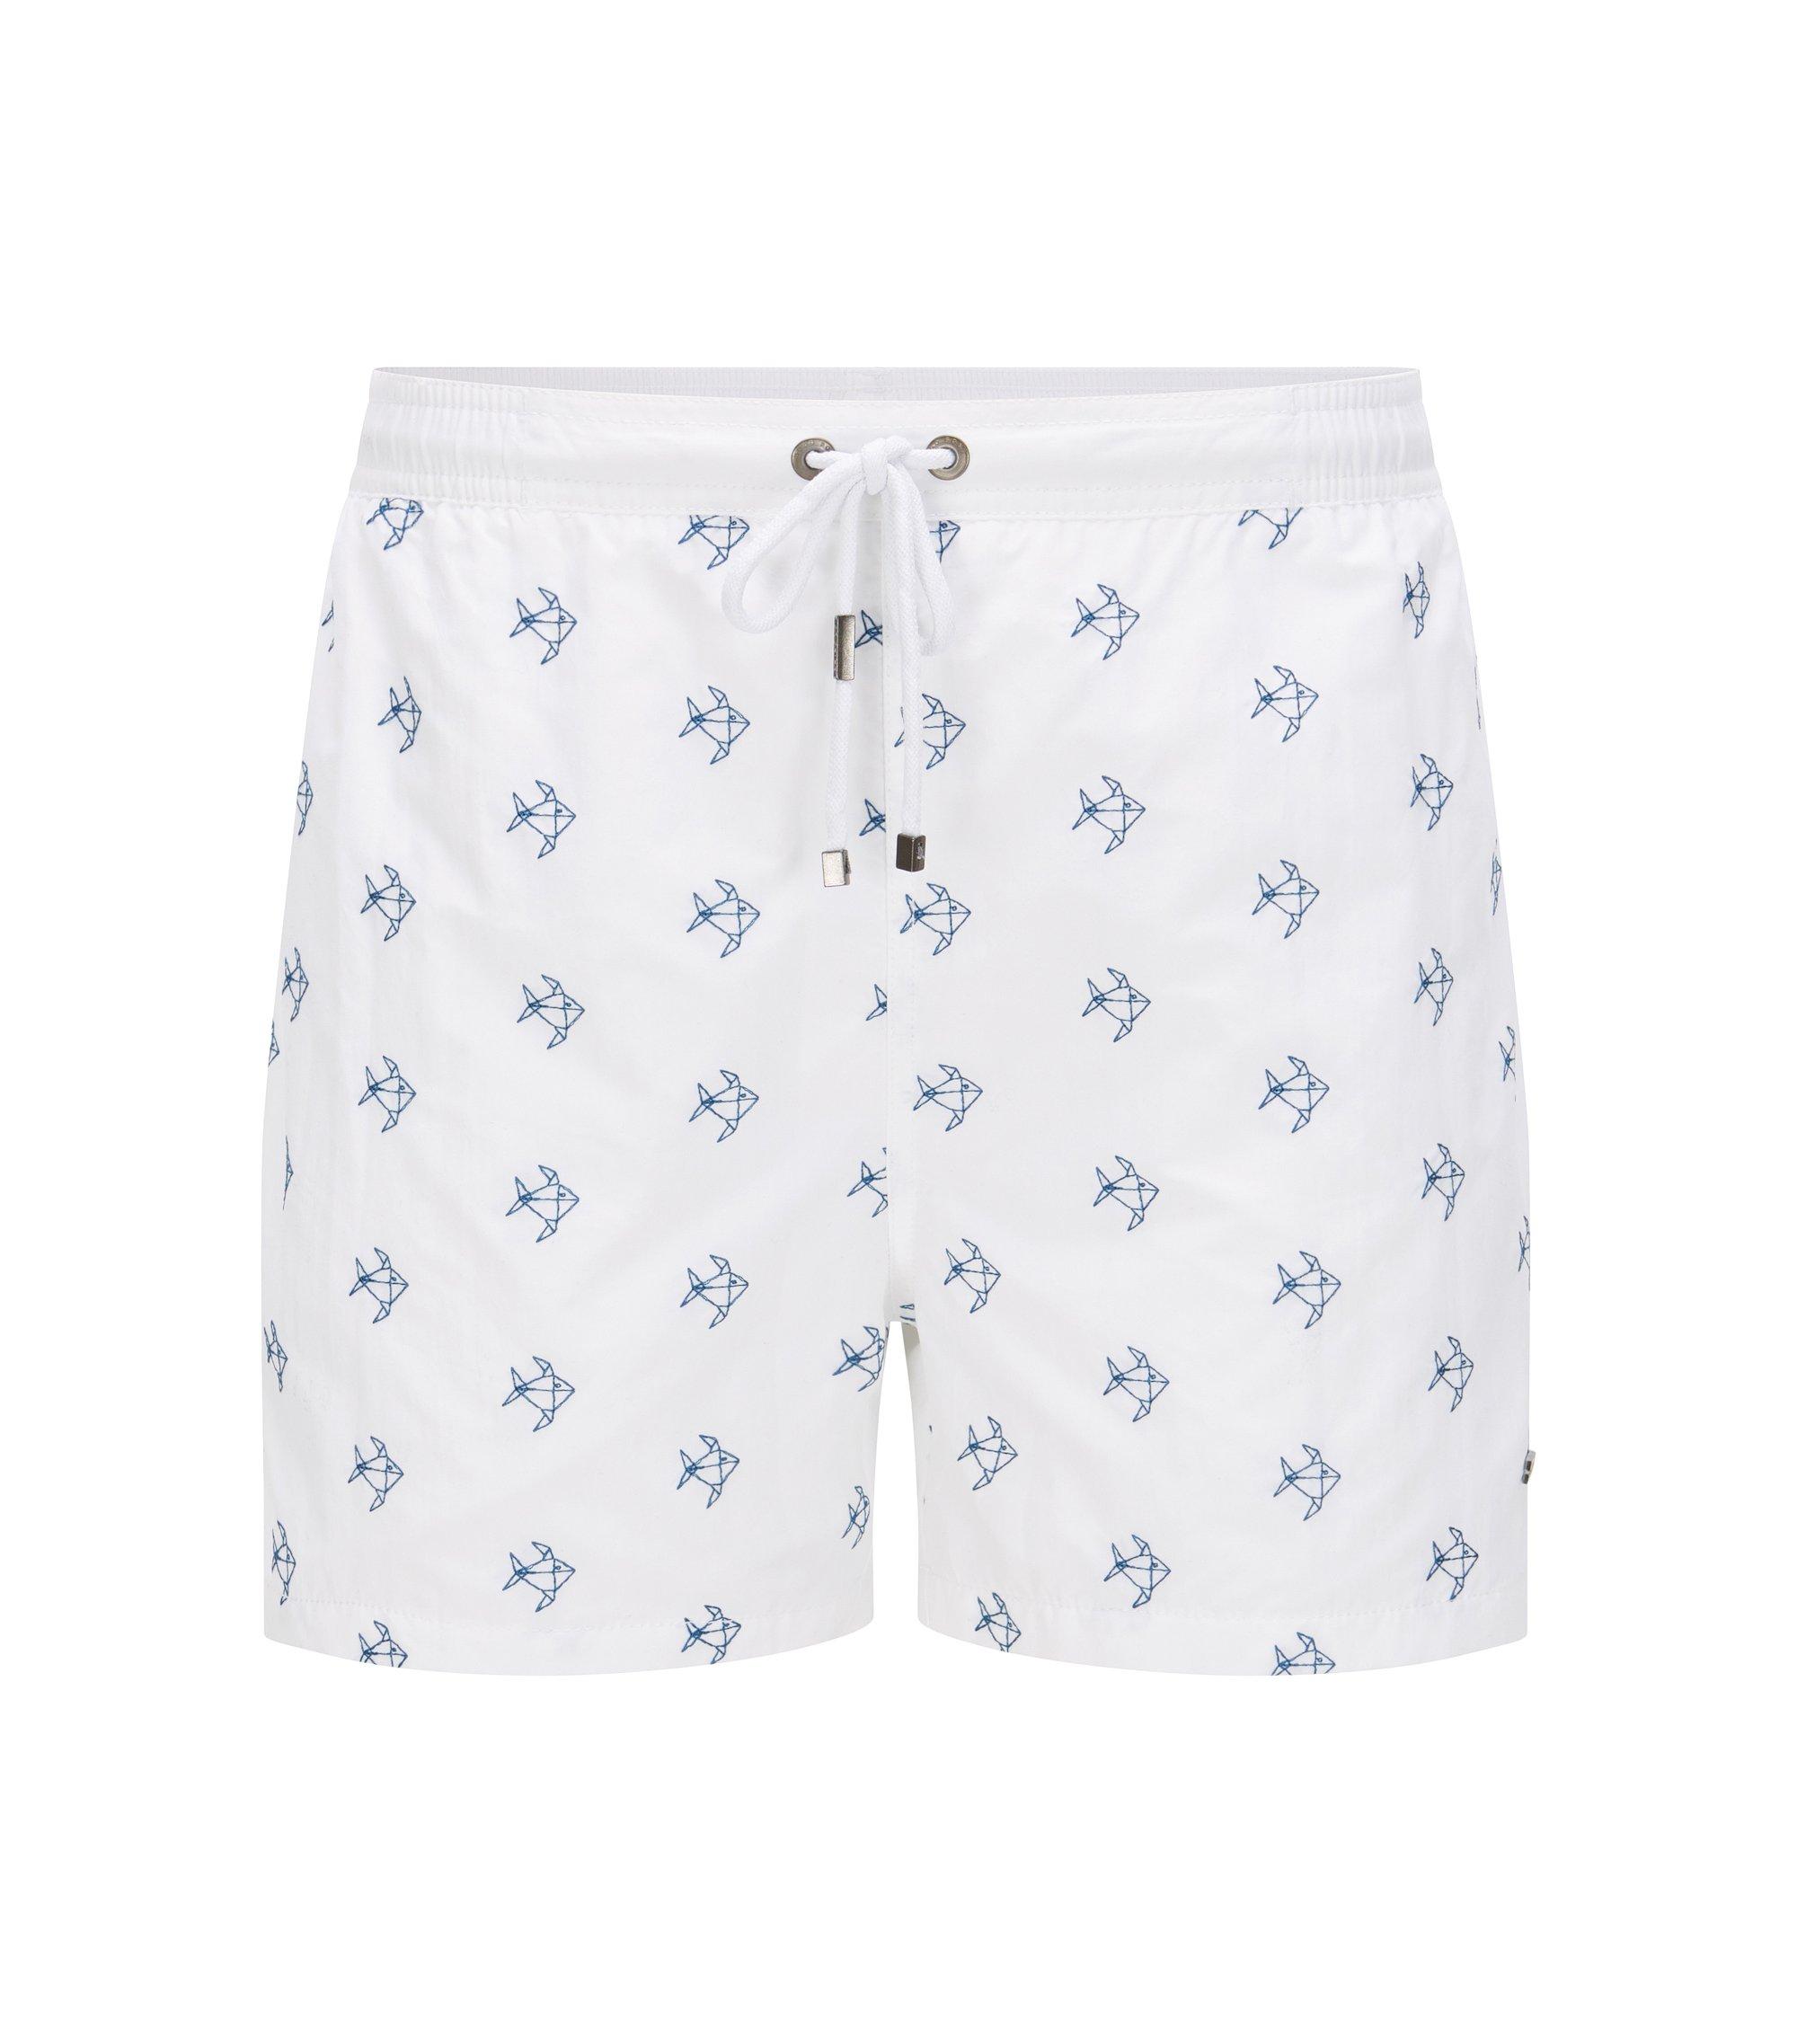 Quick Dry Nylon Embroidered Swim Short | White Shark, Open White